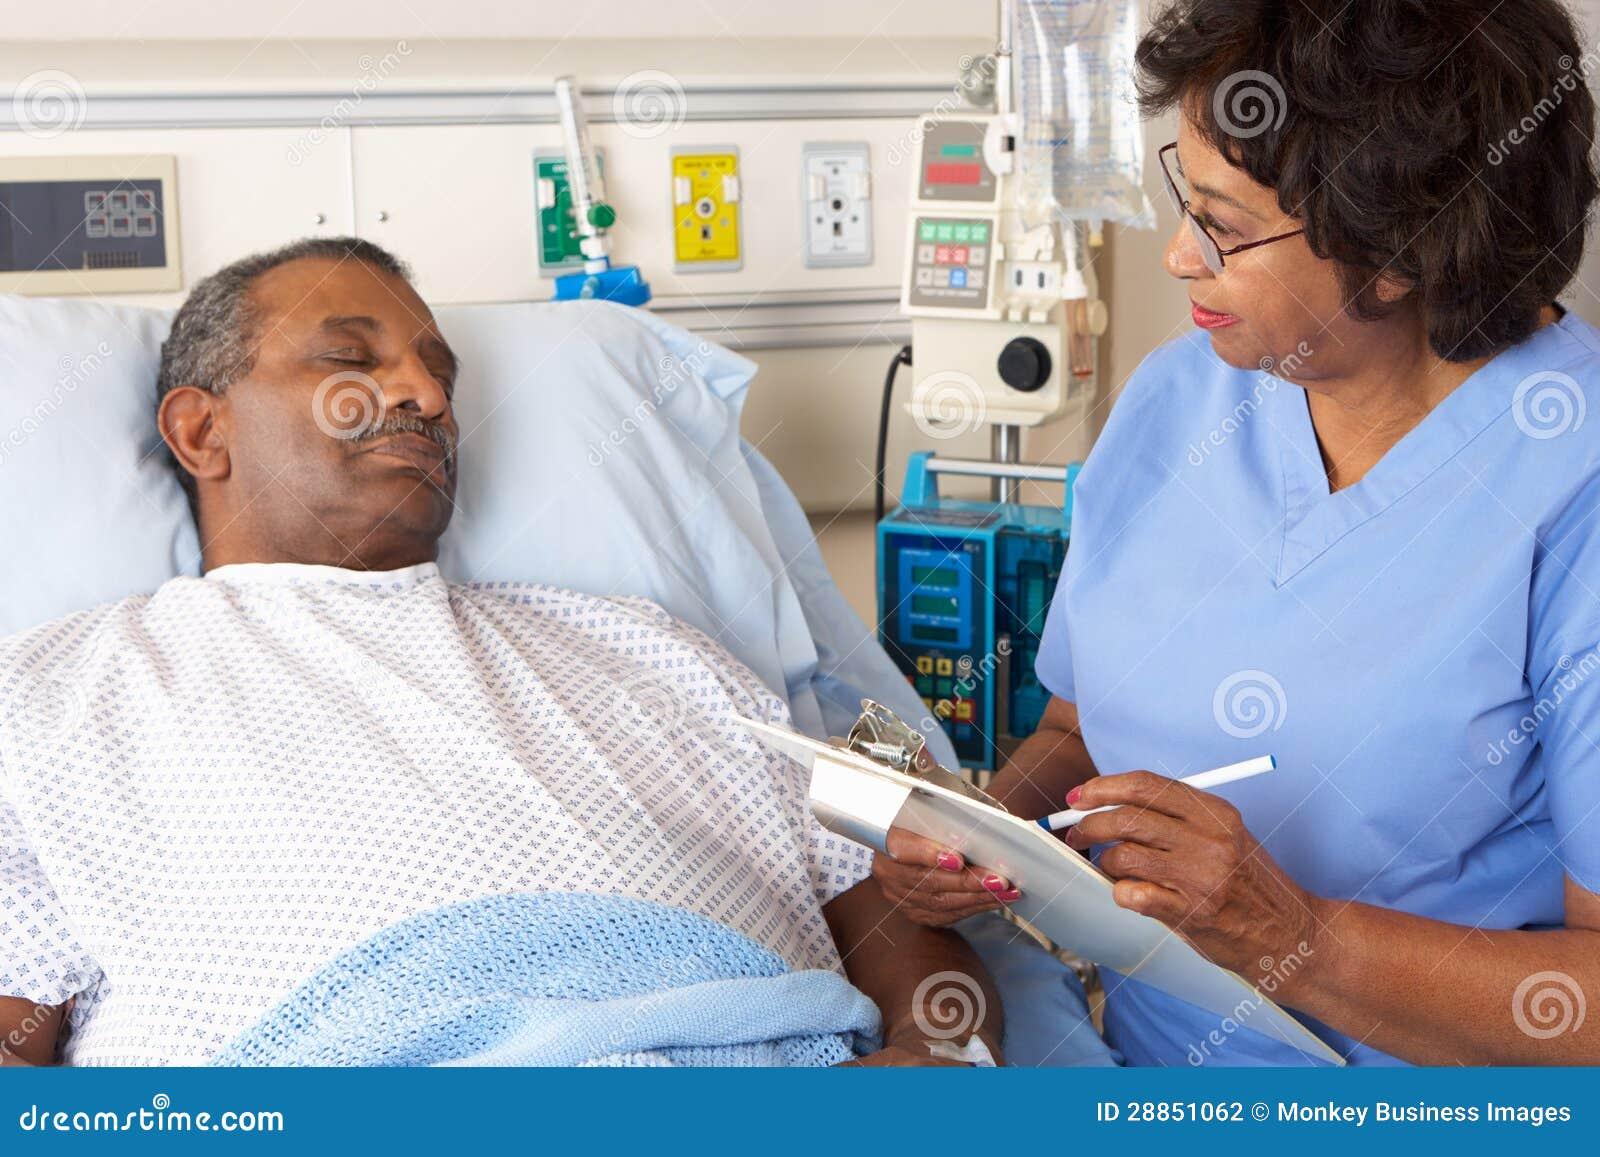 how to become a cancer nurse